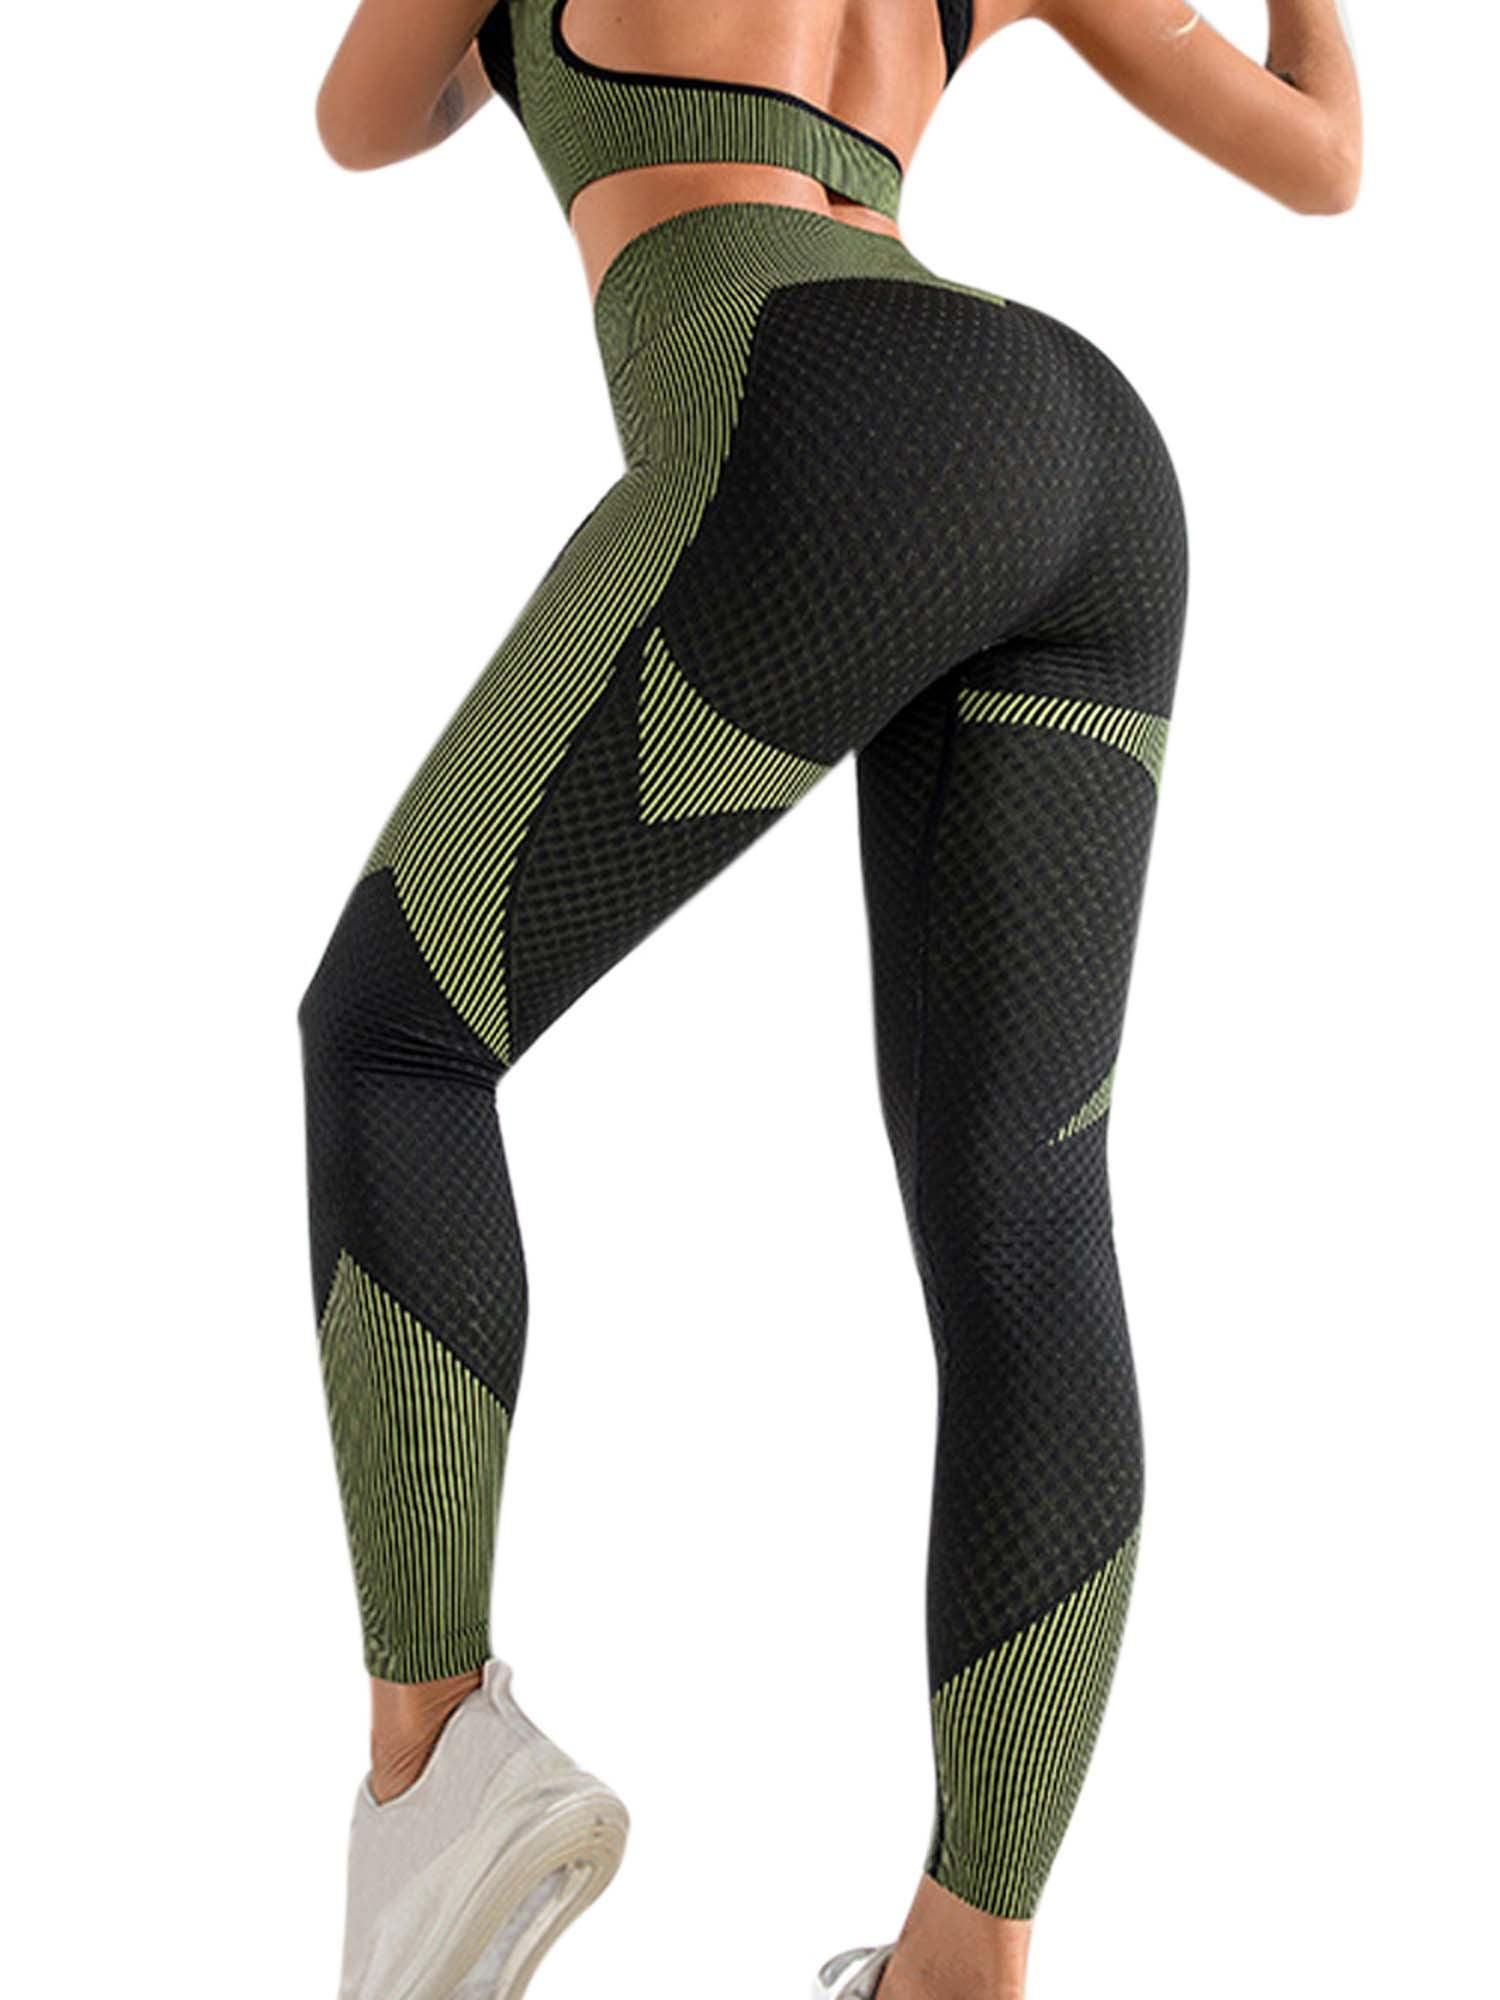 Women PUSH UP Fitness Gym Trousers Jogging High Waist Yoga Leggings Pants Sports